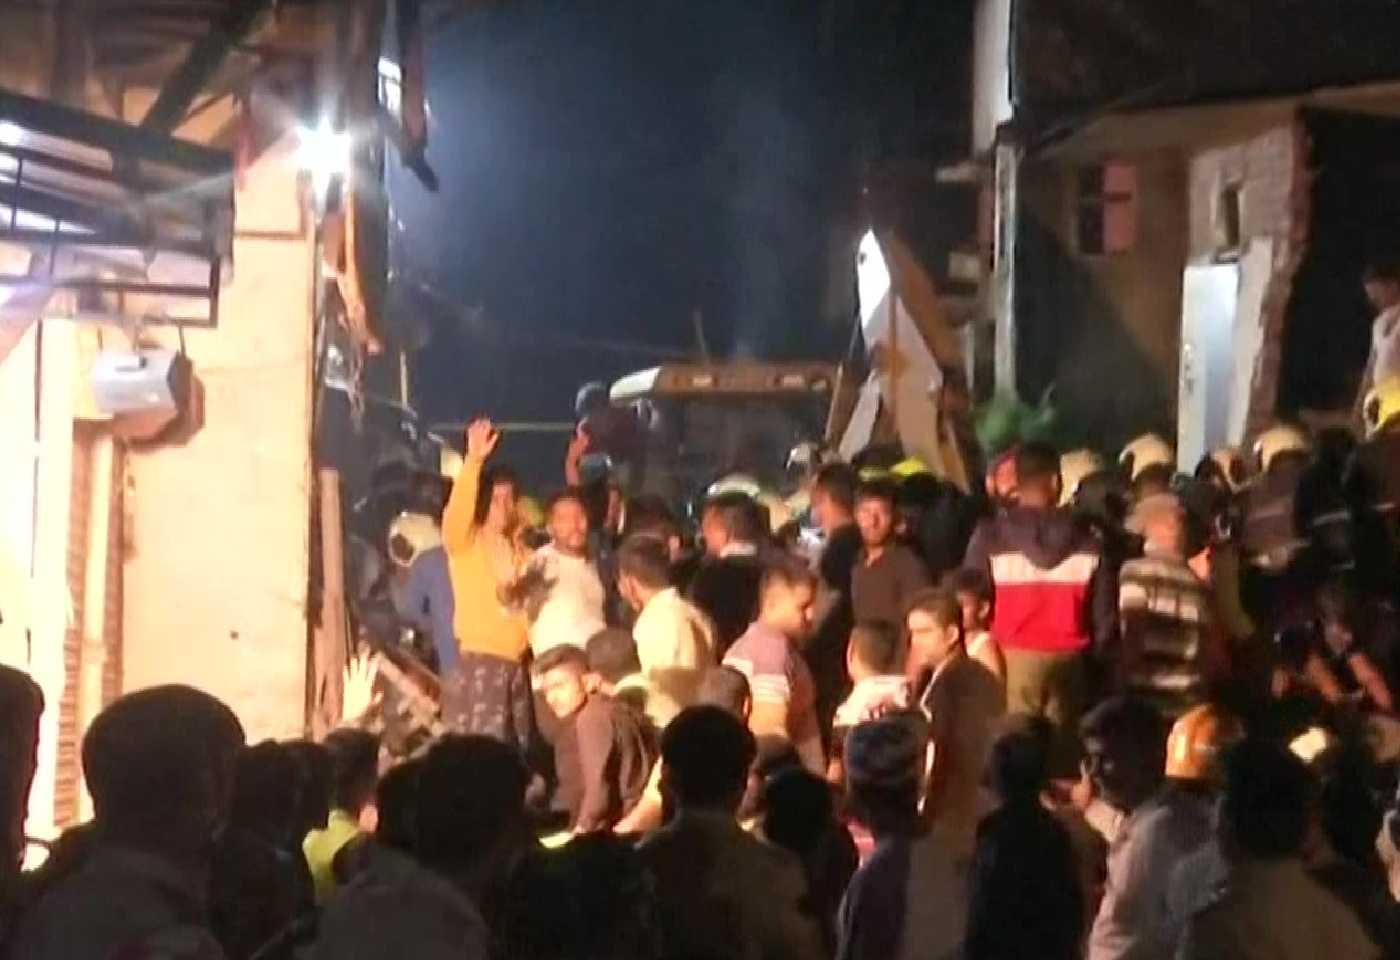 4 storey Building Collapsed In Malavani area Mumbai, 11 People Died, 8 Injured